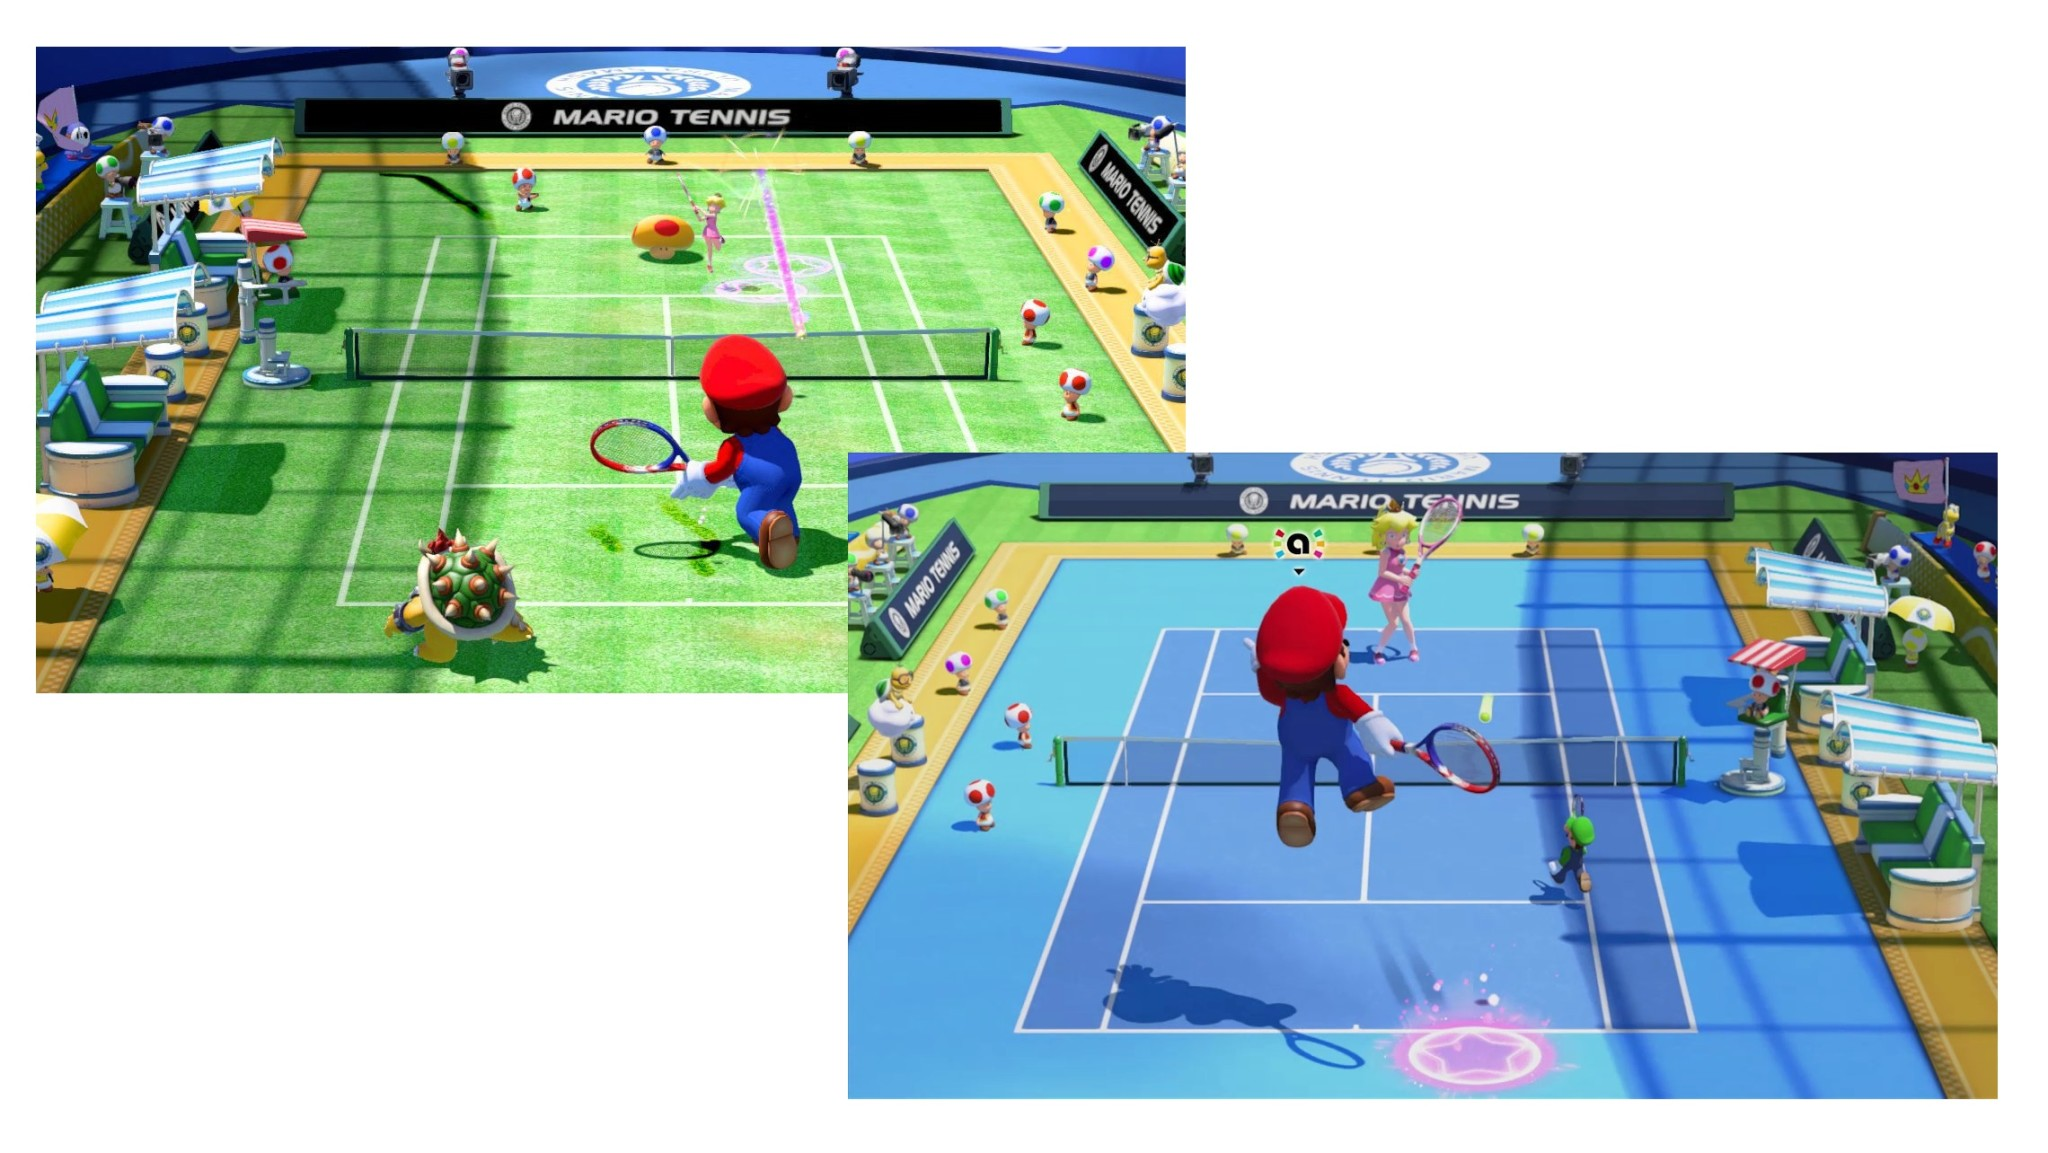 Mario Tennis Ultra Smash Wii U (6)